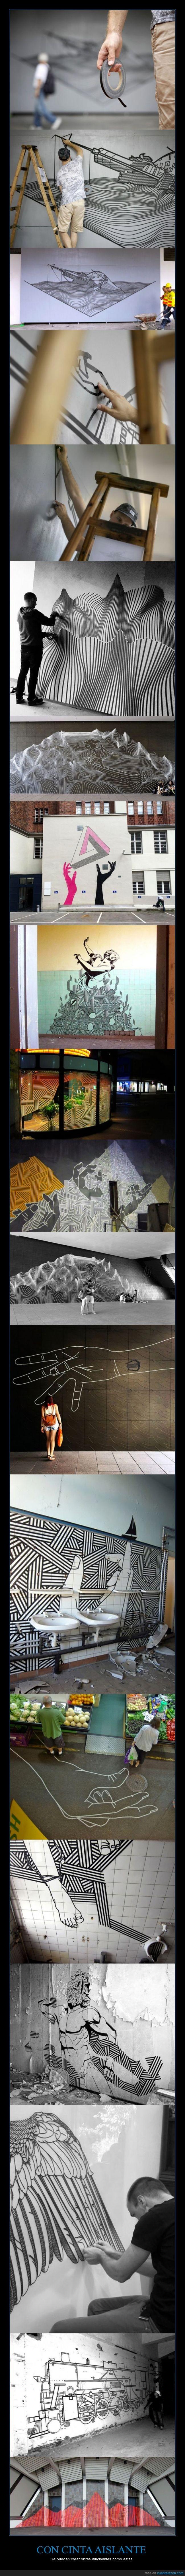 aislante,arte,asia,celo,cinta,geometria,laocoonte,mural,pintor,protector,tren